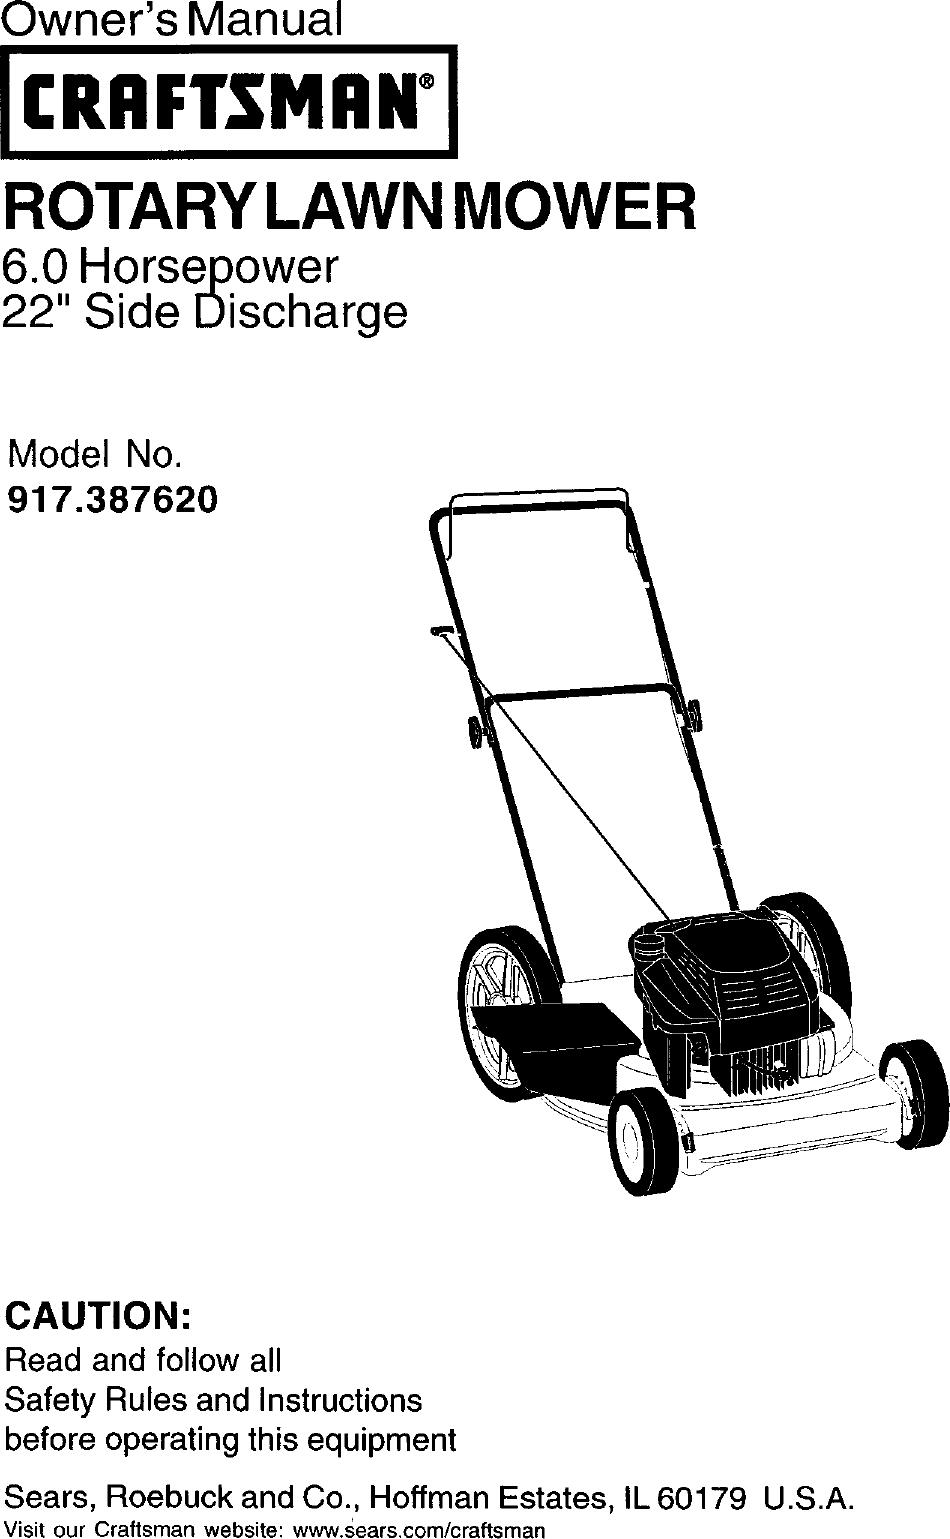 Craftsman Push Lawn Mower Owners Manual Satu Sticker Electric 3 In 1 Electrical Schematics Model 900370510 917387620 User Gas Walk Behind Lawnmower Manuals